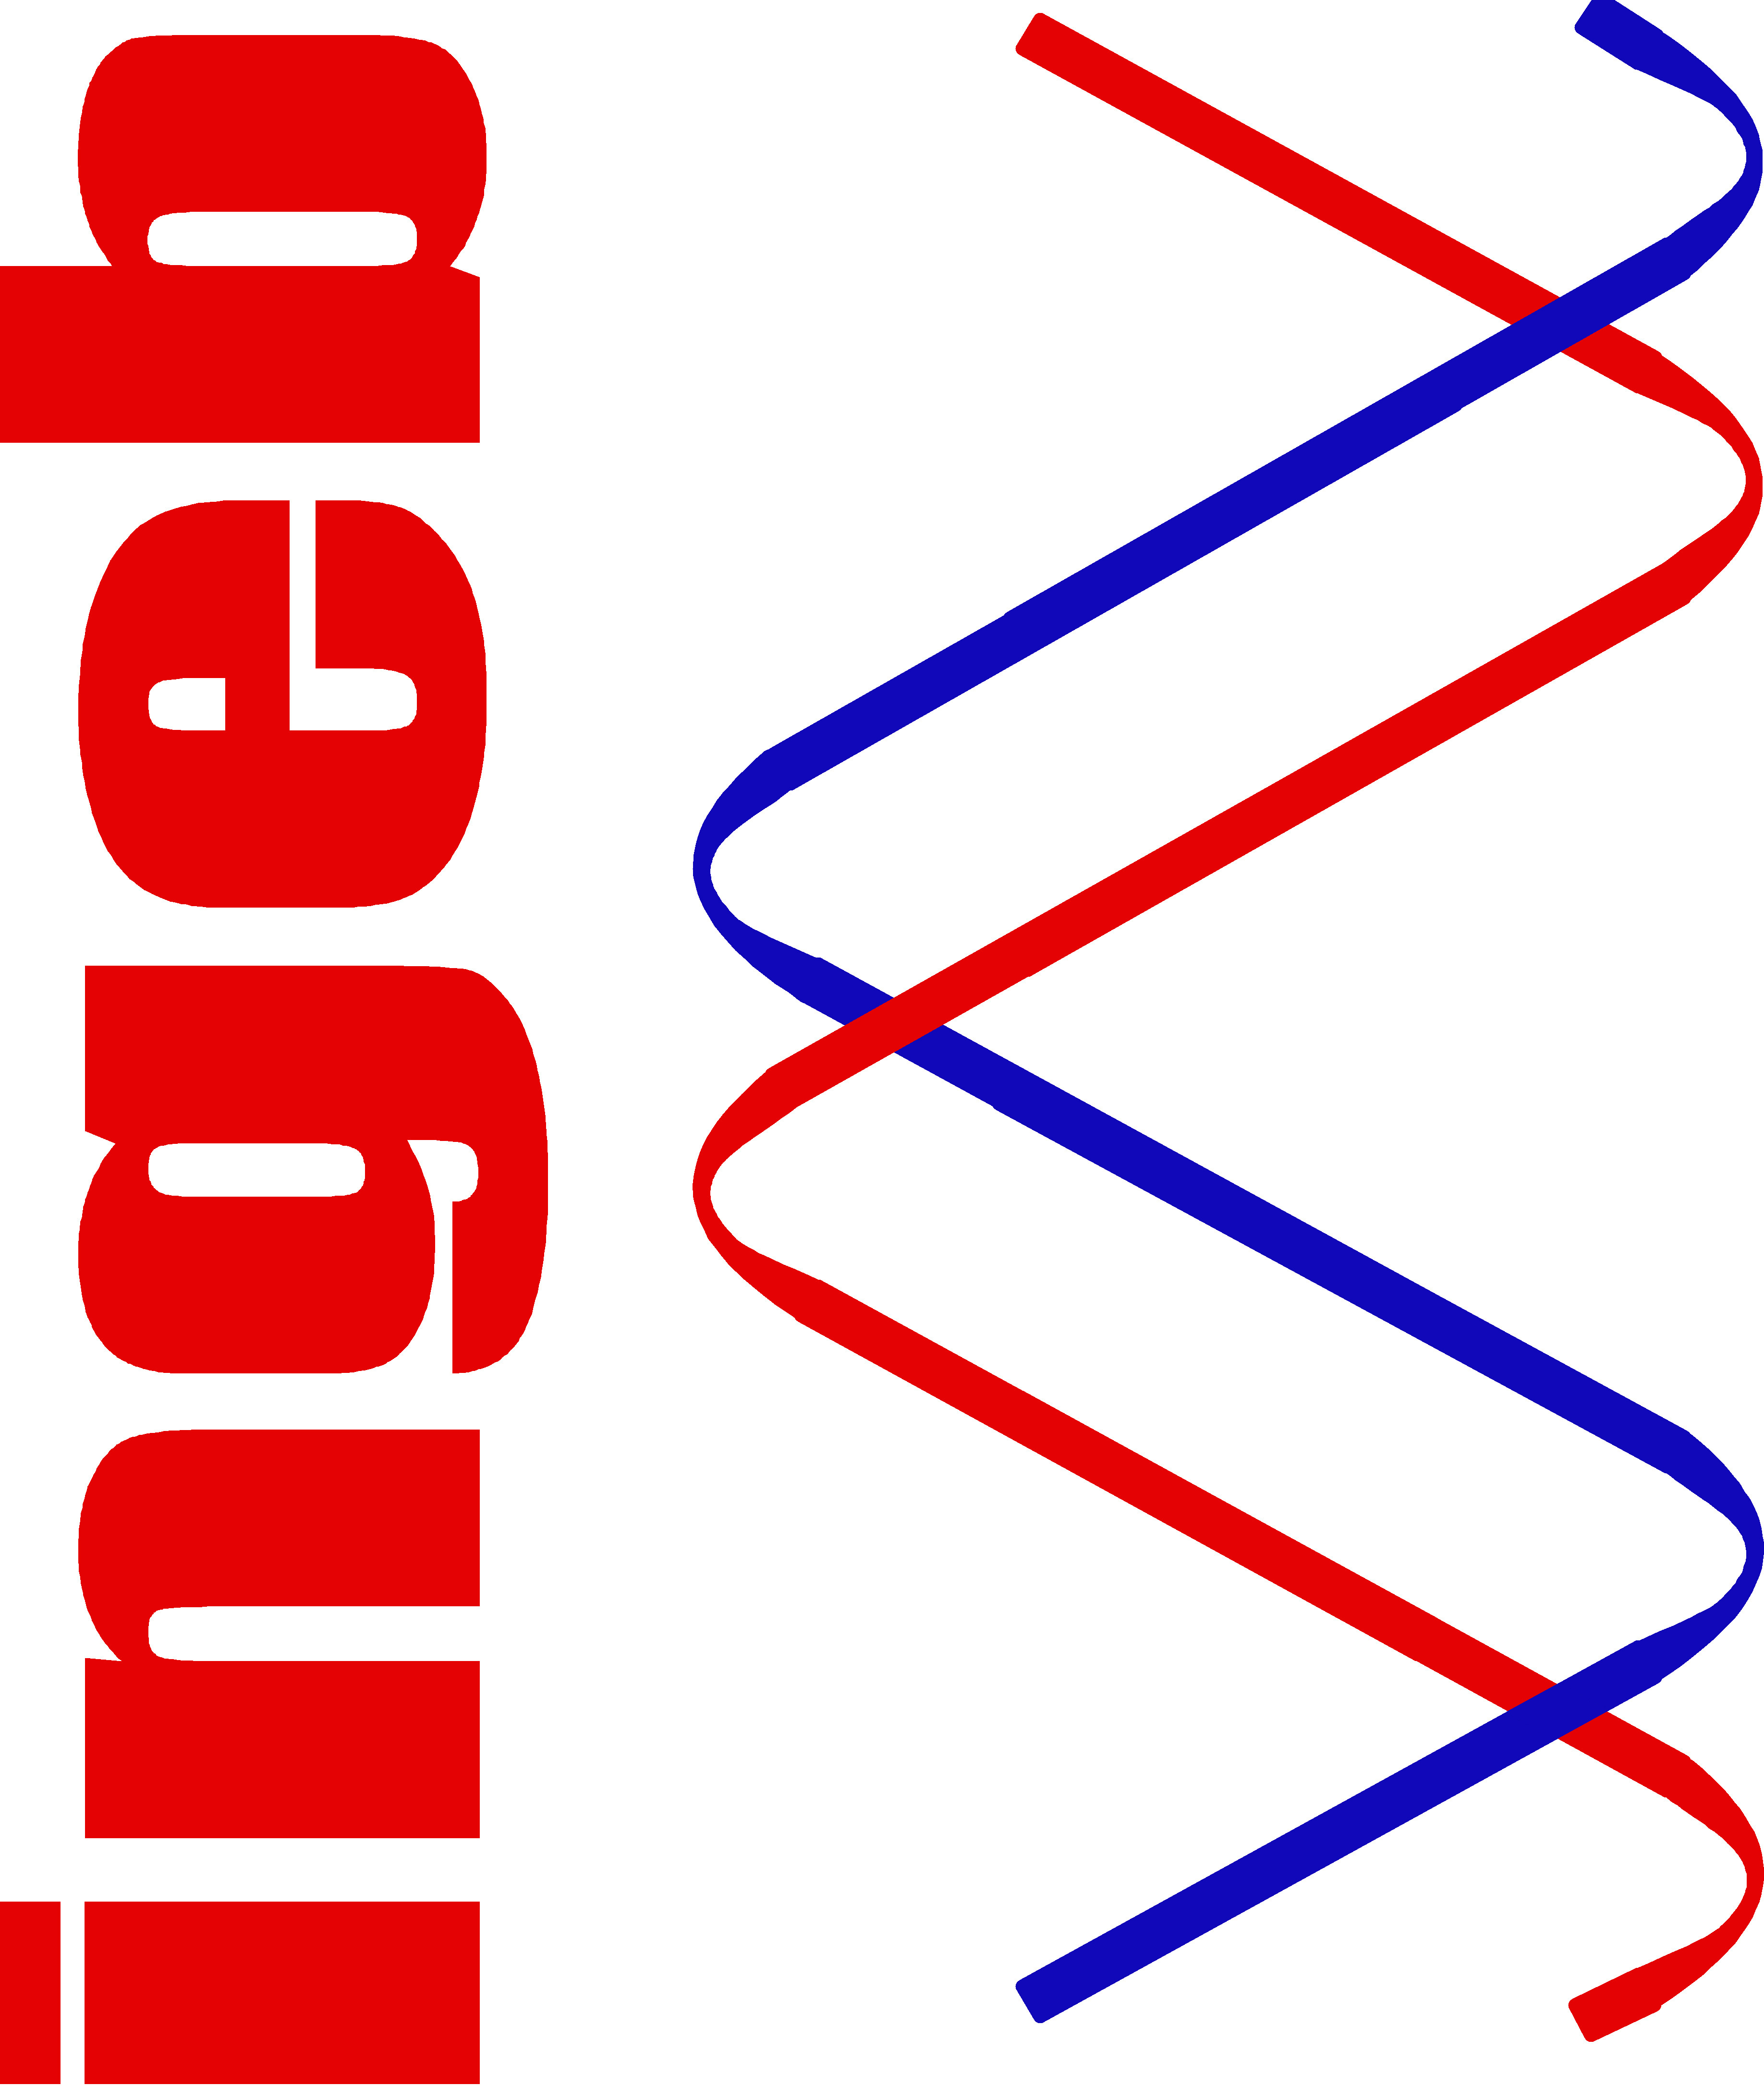 Genetic engineering wikipedia - Institute for genetic engineering and biotechnology ingeb sarajevo